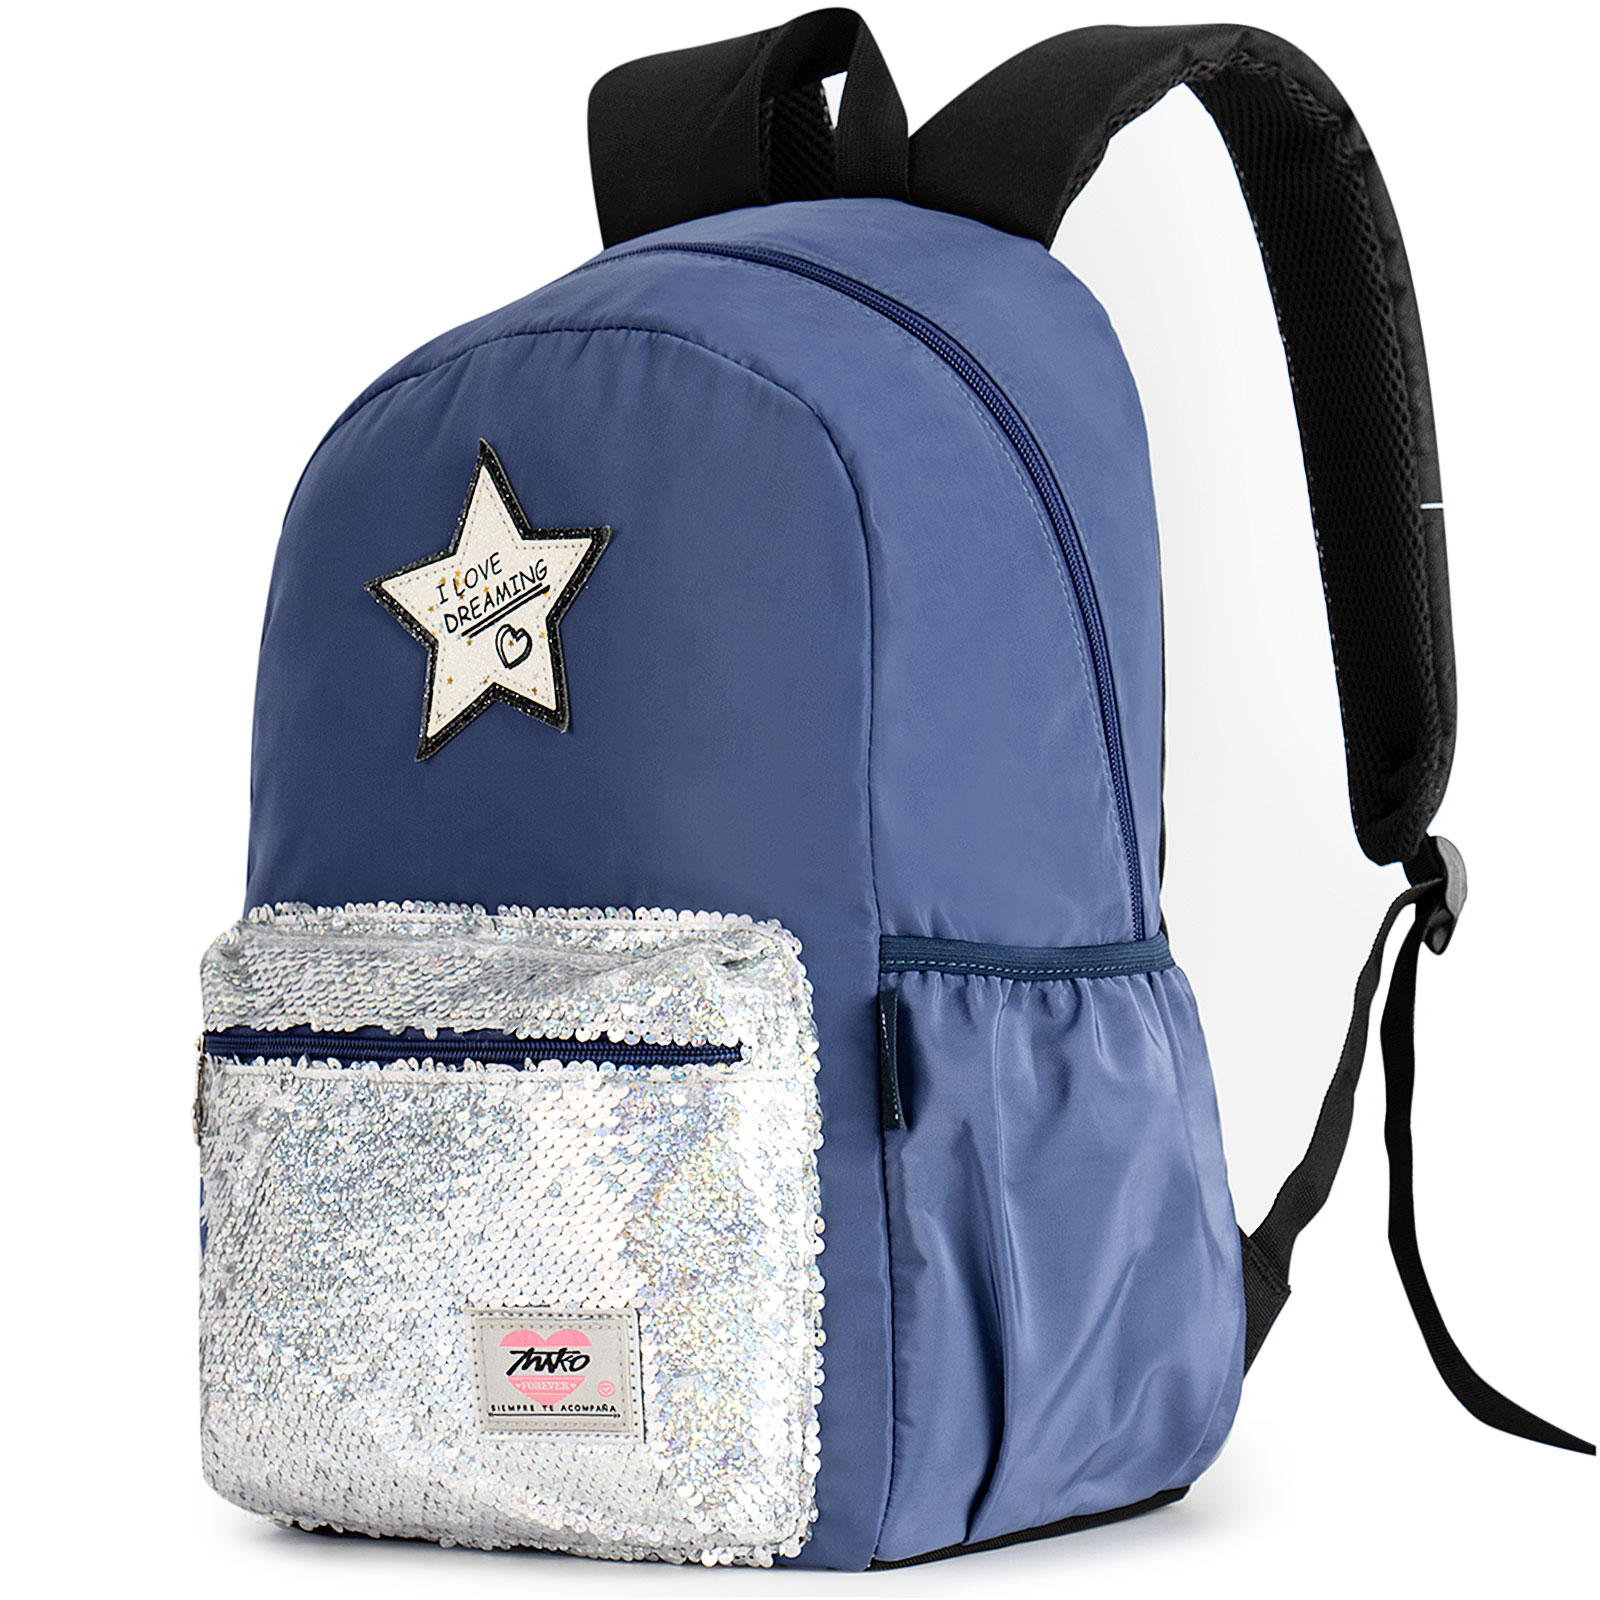 Agatsuma Zenitsu Backpack Waterproof Travel Durable Black Laptop Bag for Women and Men Multifunction Backpacks